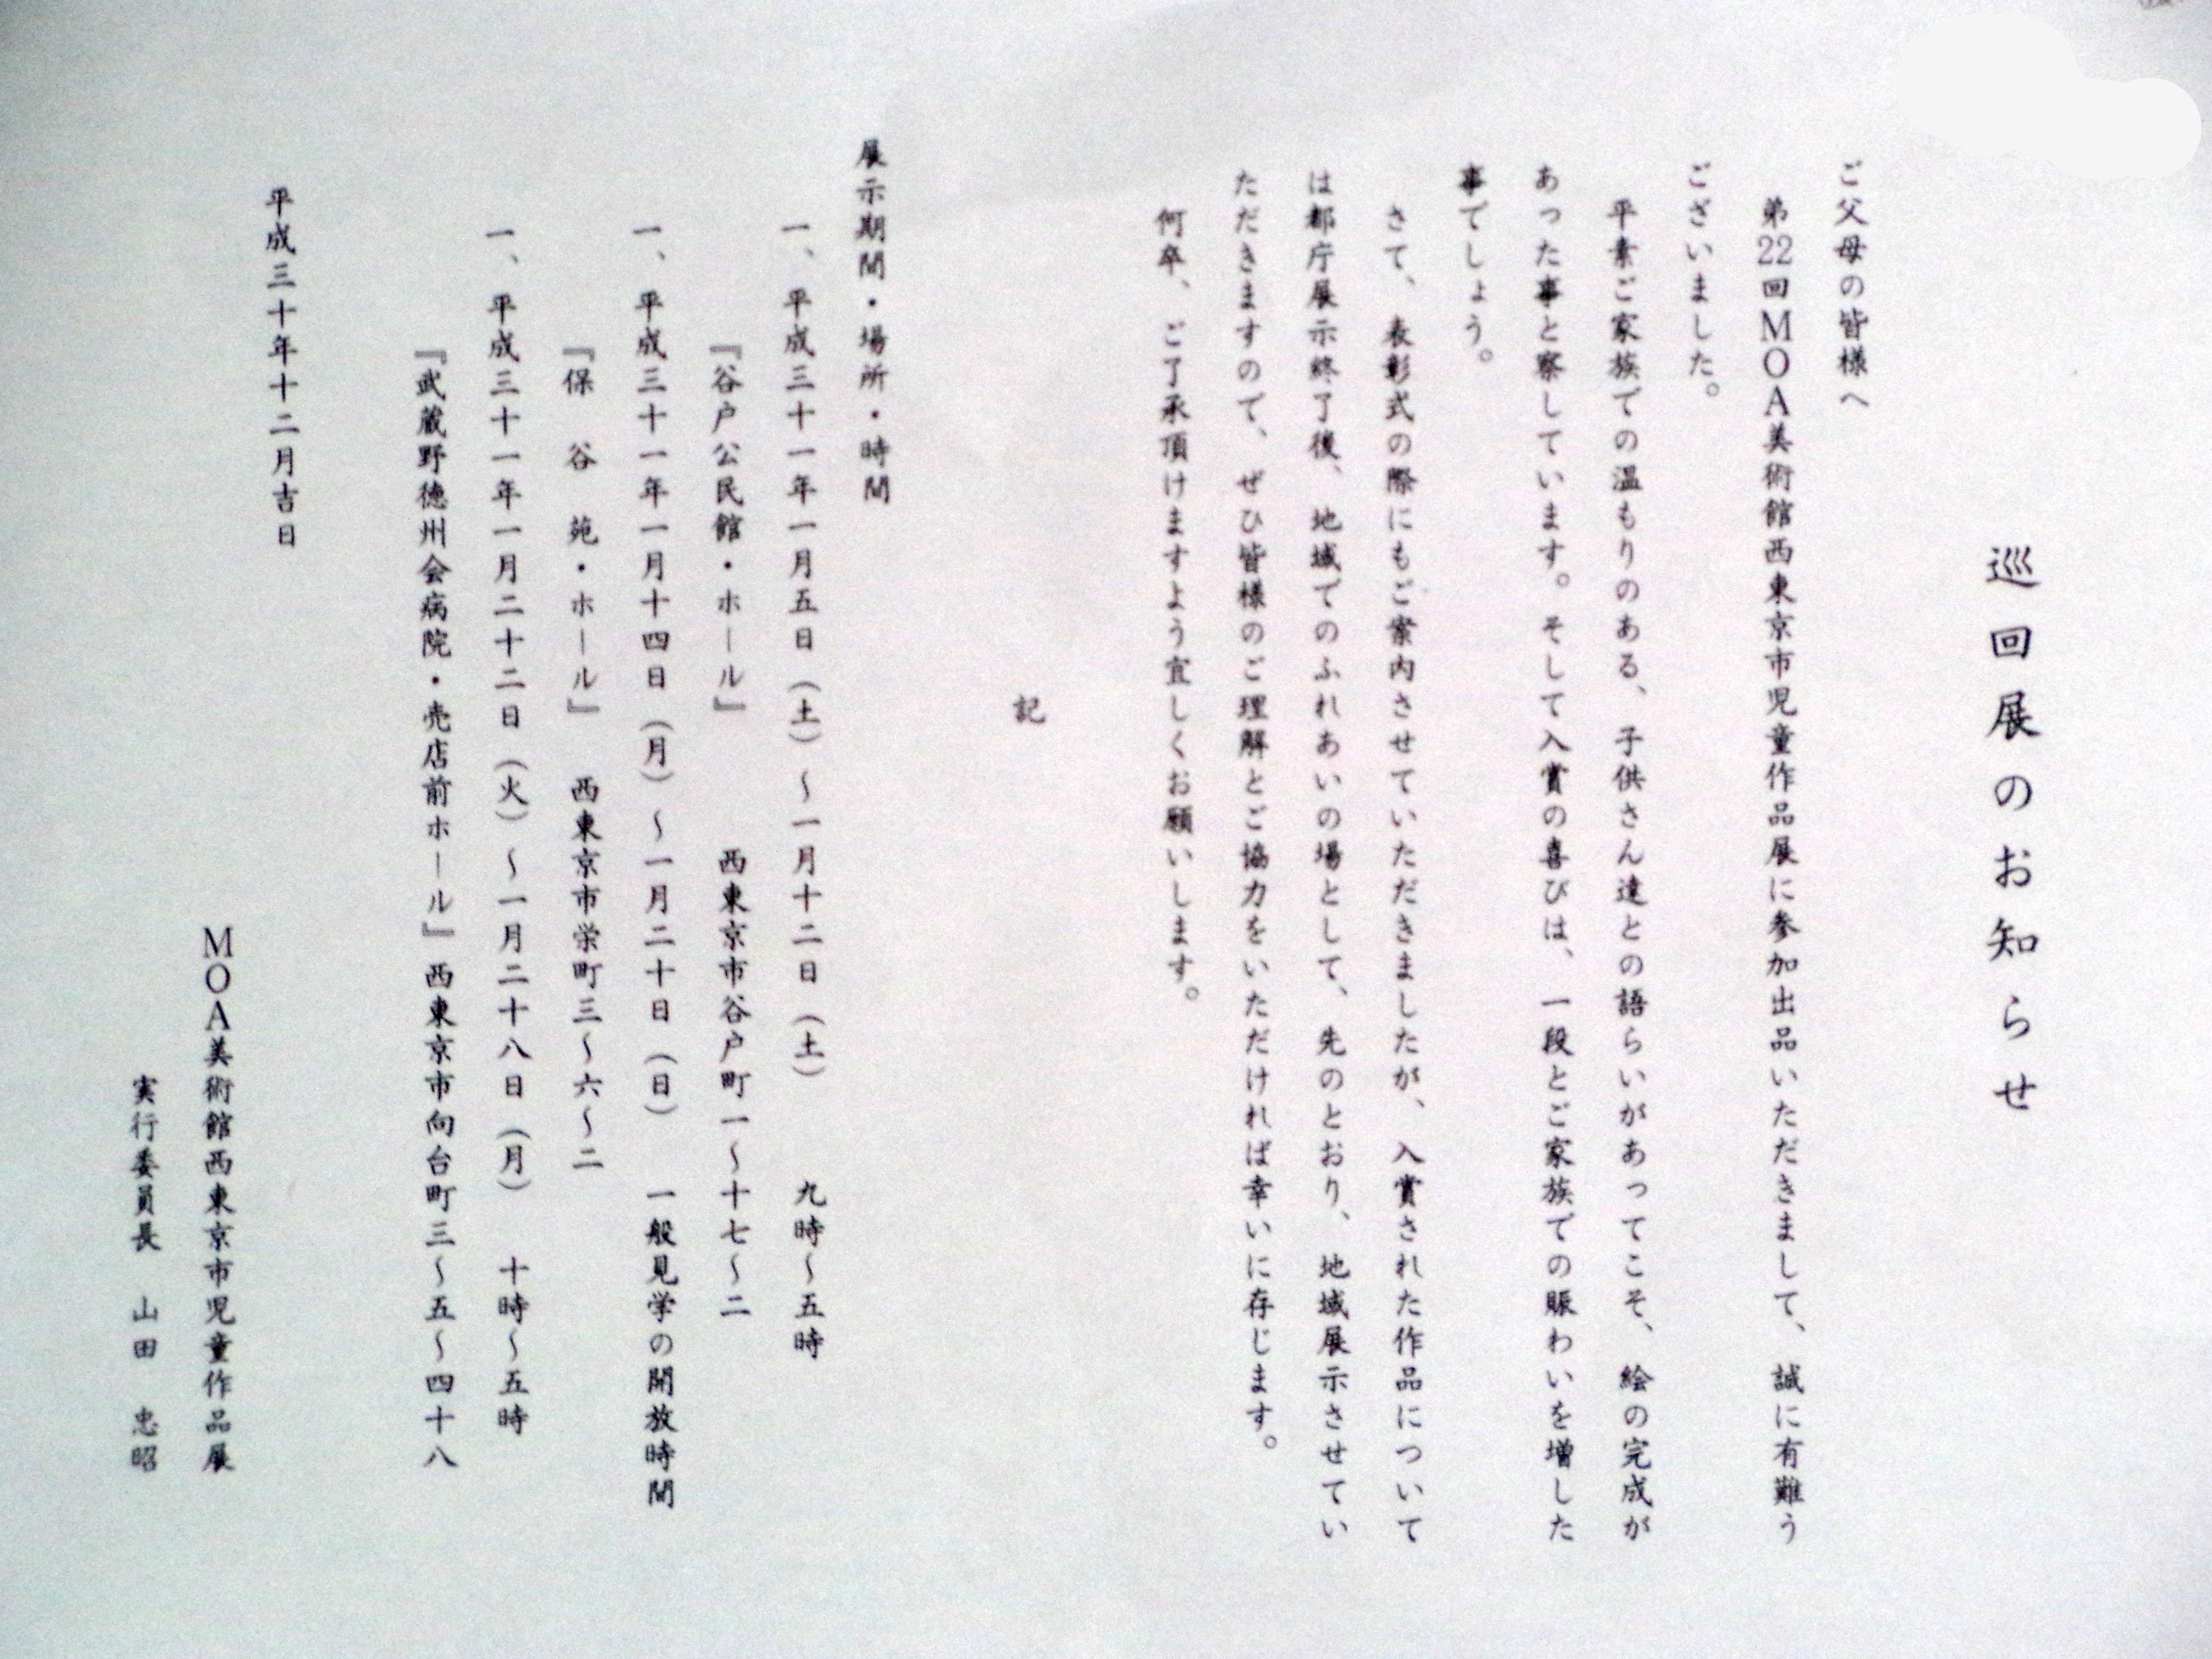 P1171287.jpg